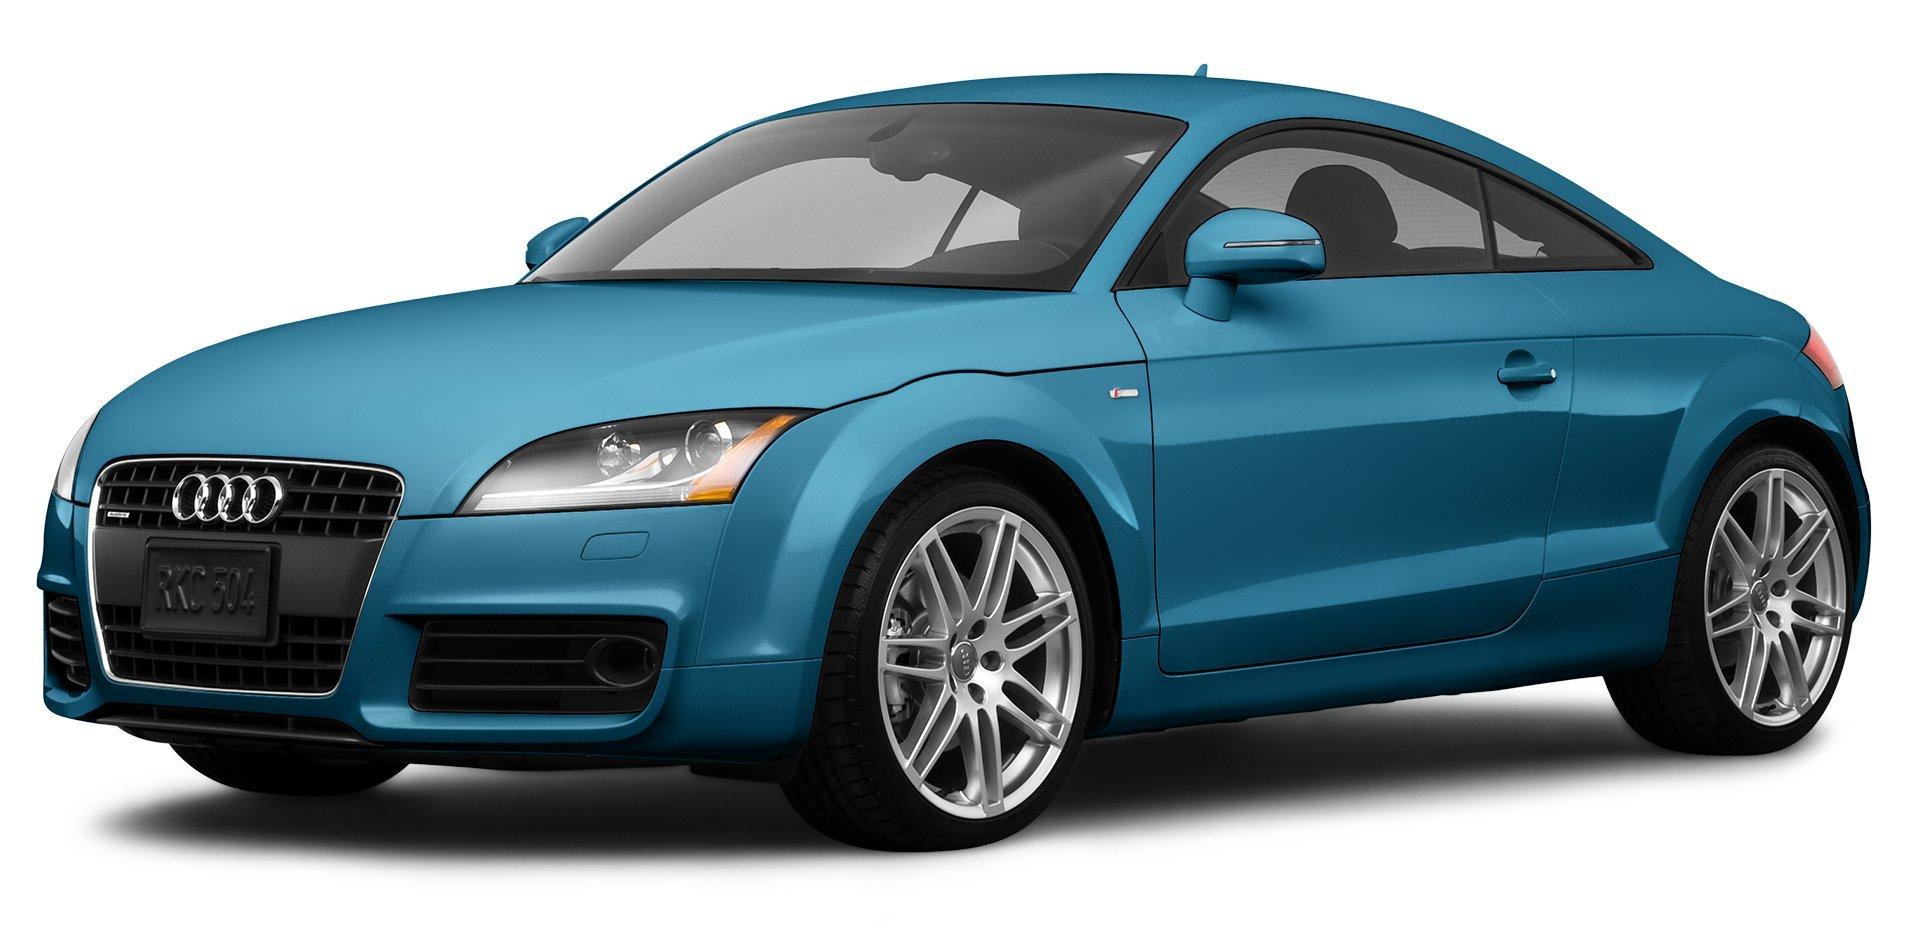 Amazoncom Audi A Quattro Reviews Images And Specs Vehicles - Audi 2 door